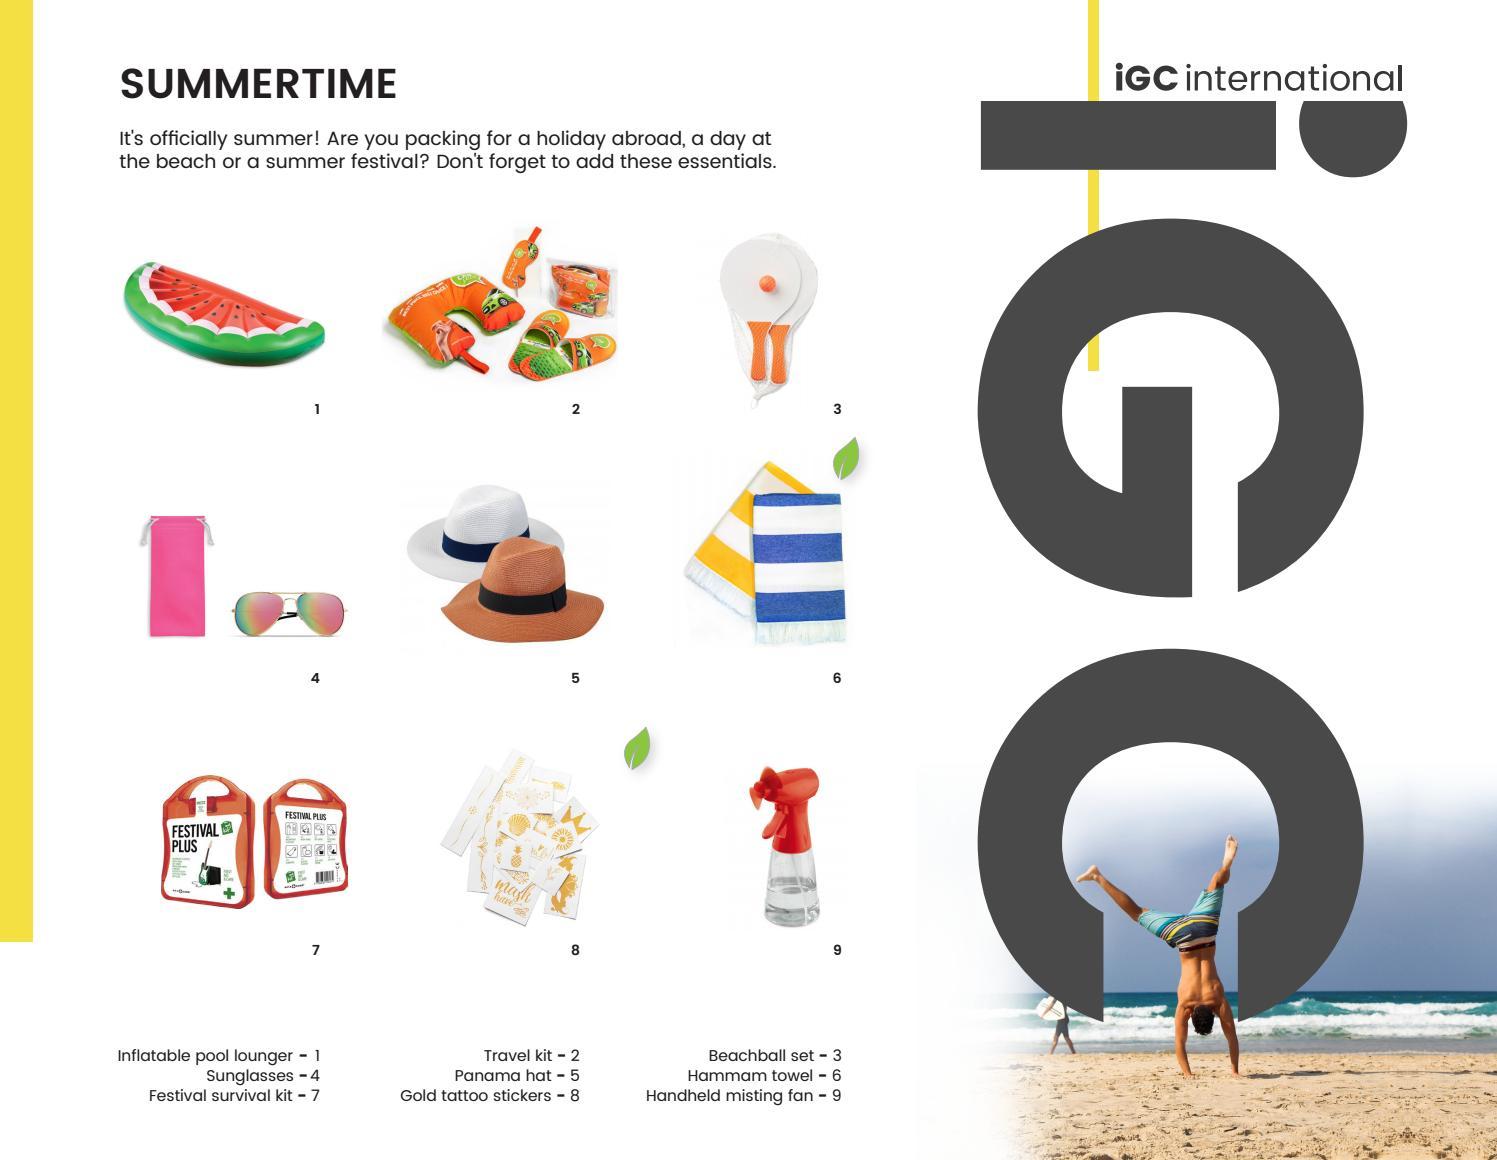 IGC International Summer Trends 2019 by IGC International - issuu